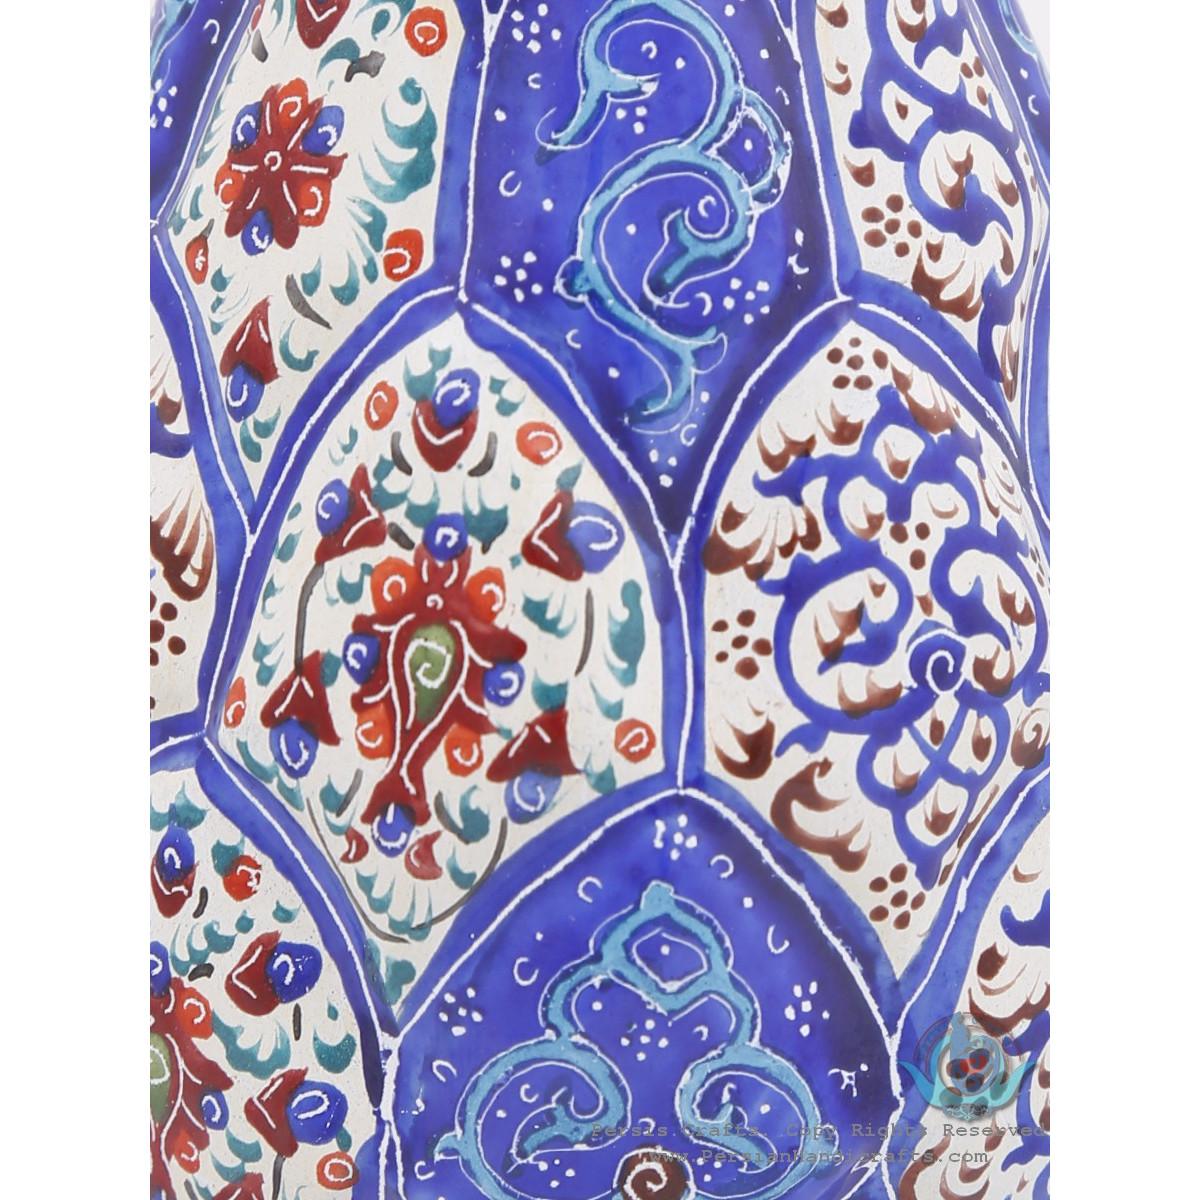 Enamel Classical Eslimi Toranj Minakari Flower Vase - HE3902-Persian Handicrafts